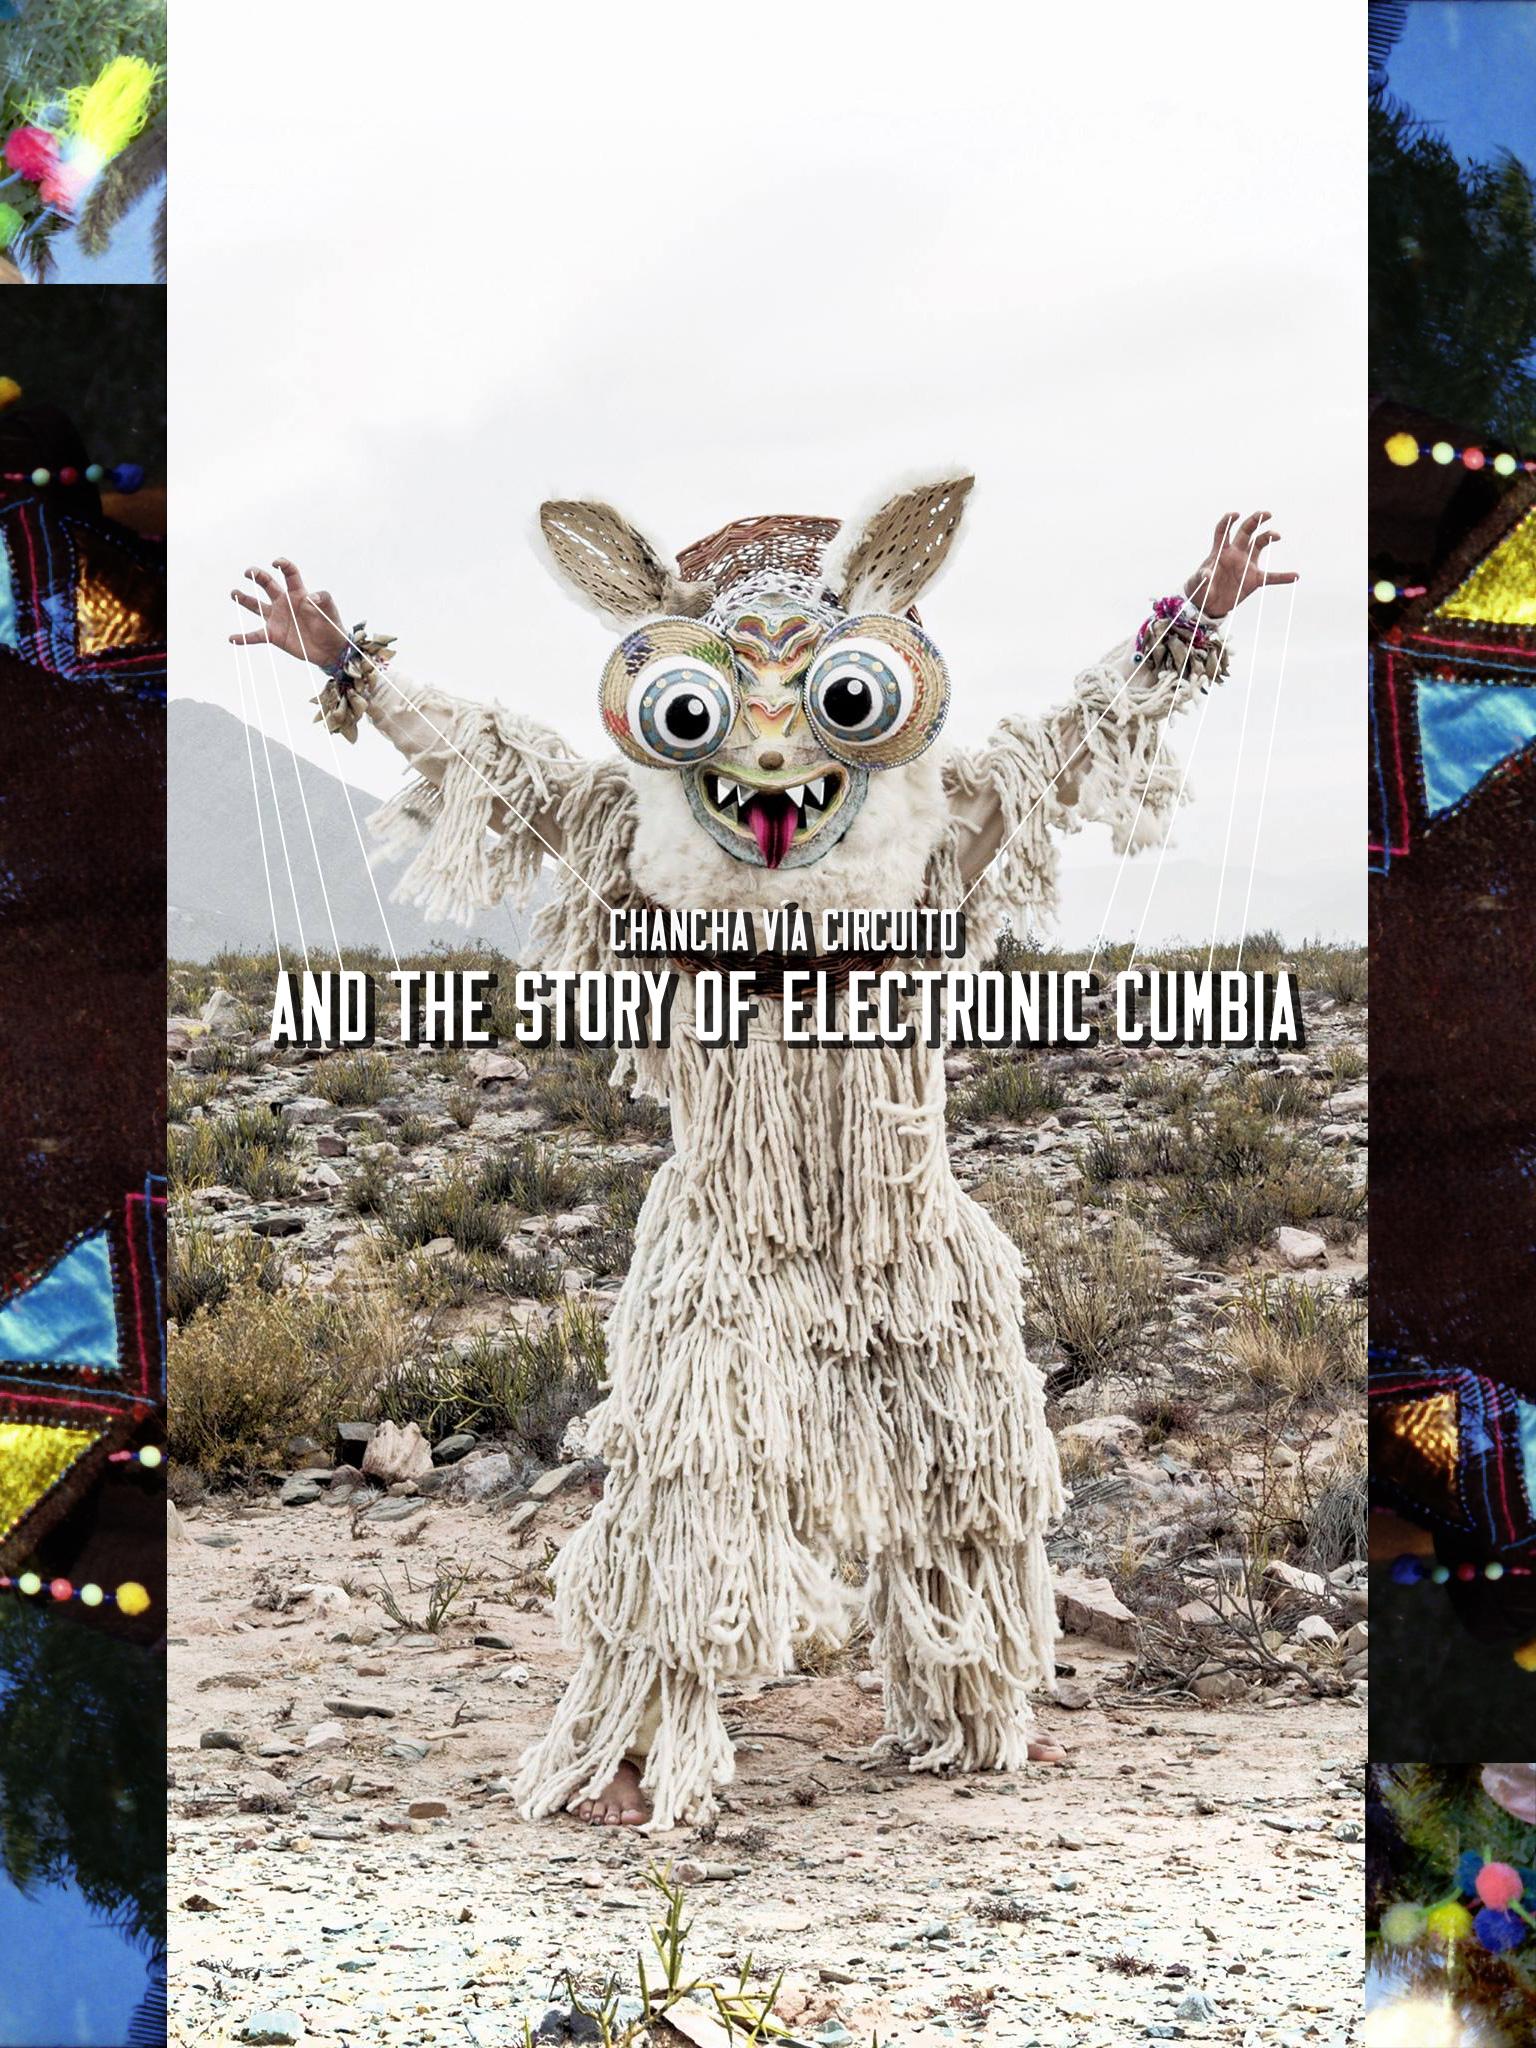 Circuito Oregon : Ra: chancha vía circuito and the story of electronic cumbia